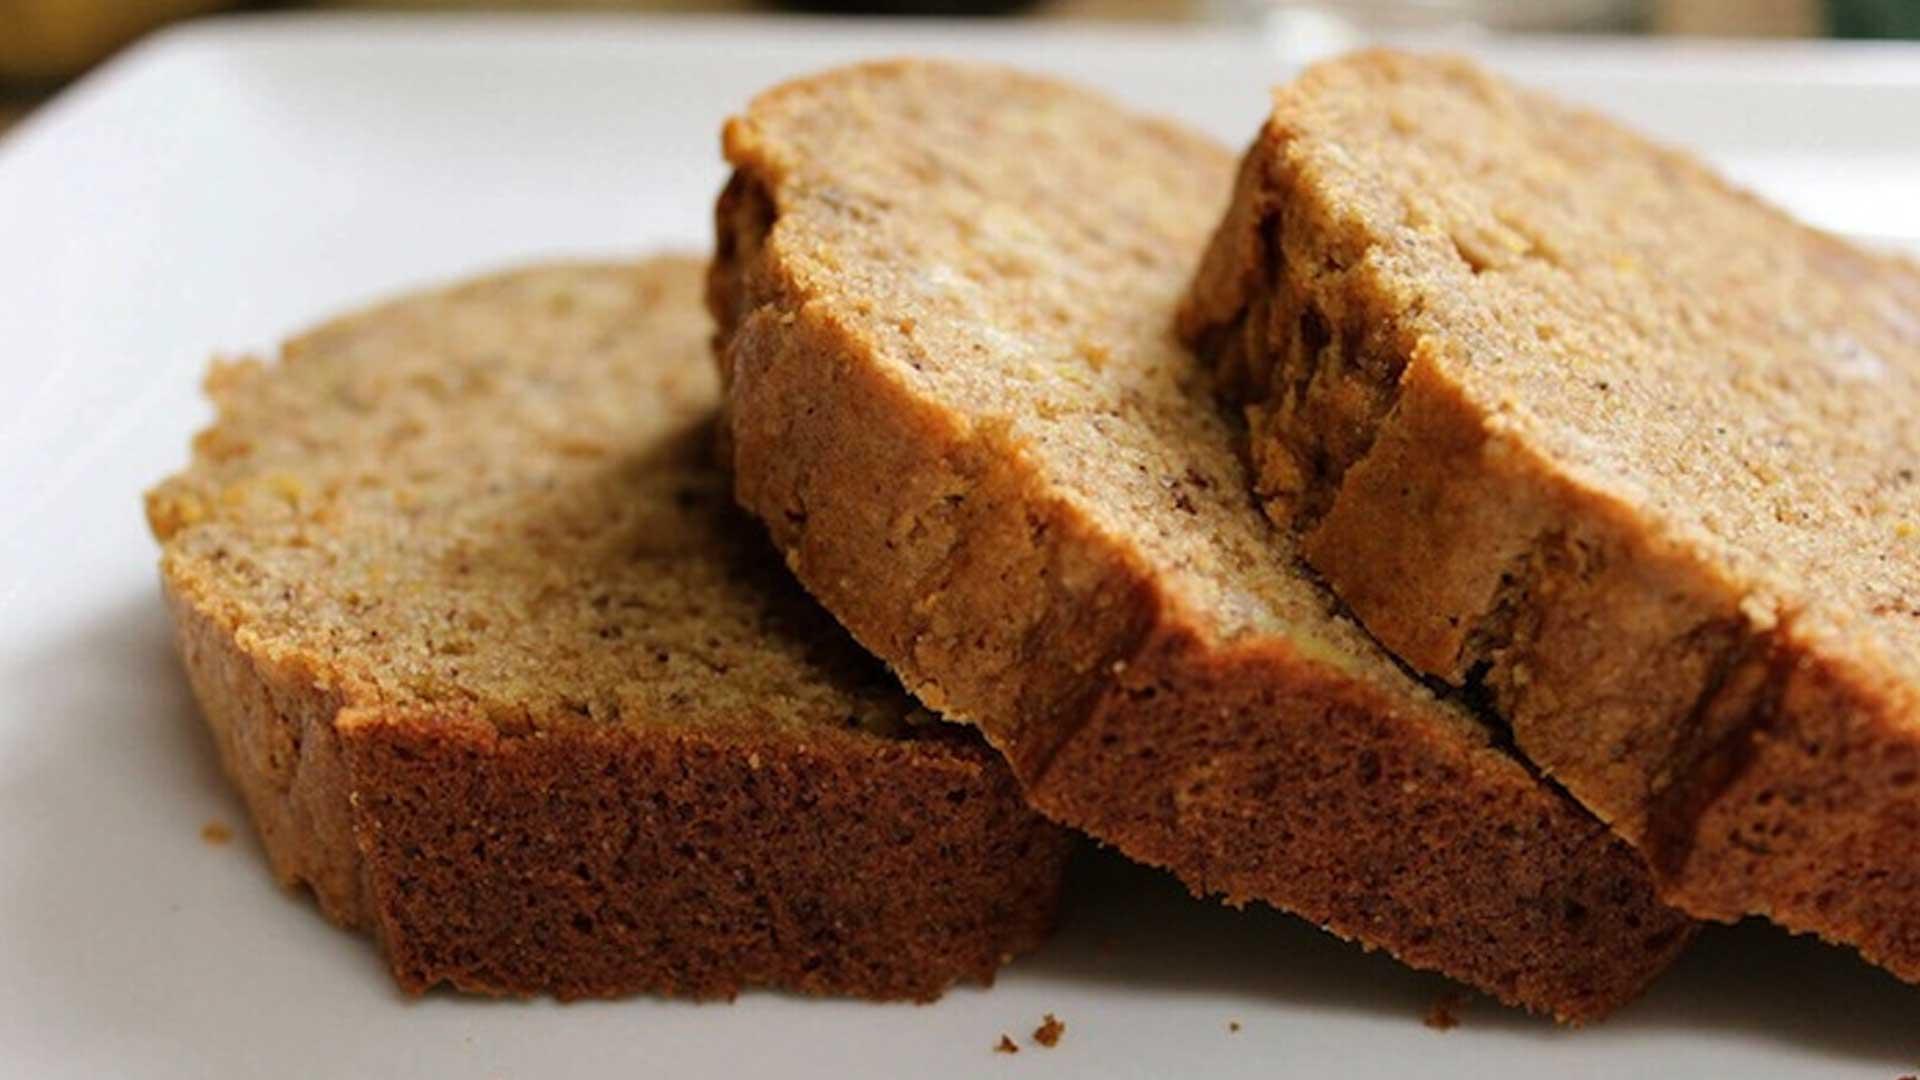 Plantain Spice Bread, Grain, Egg, and Nut-free